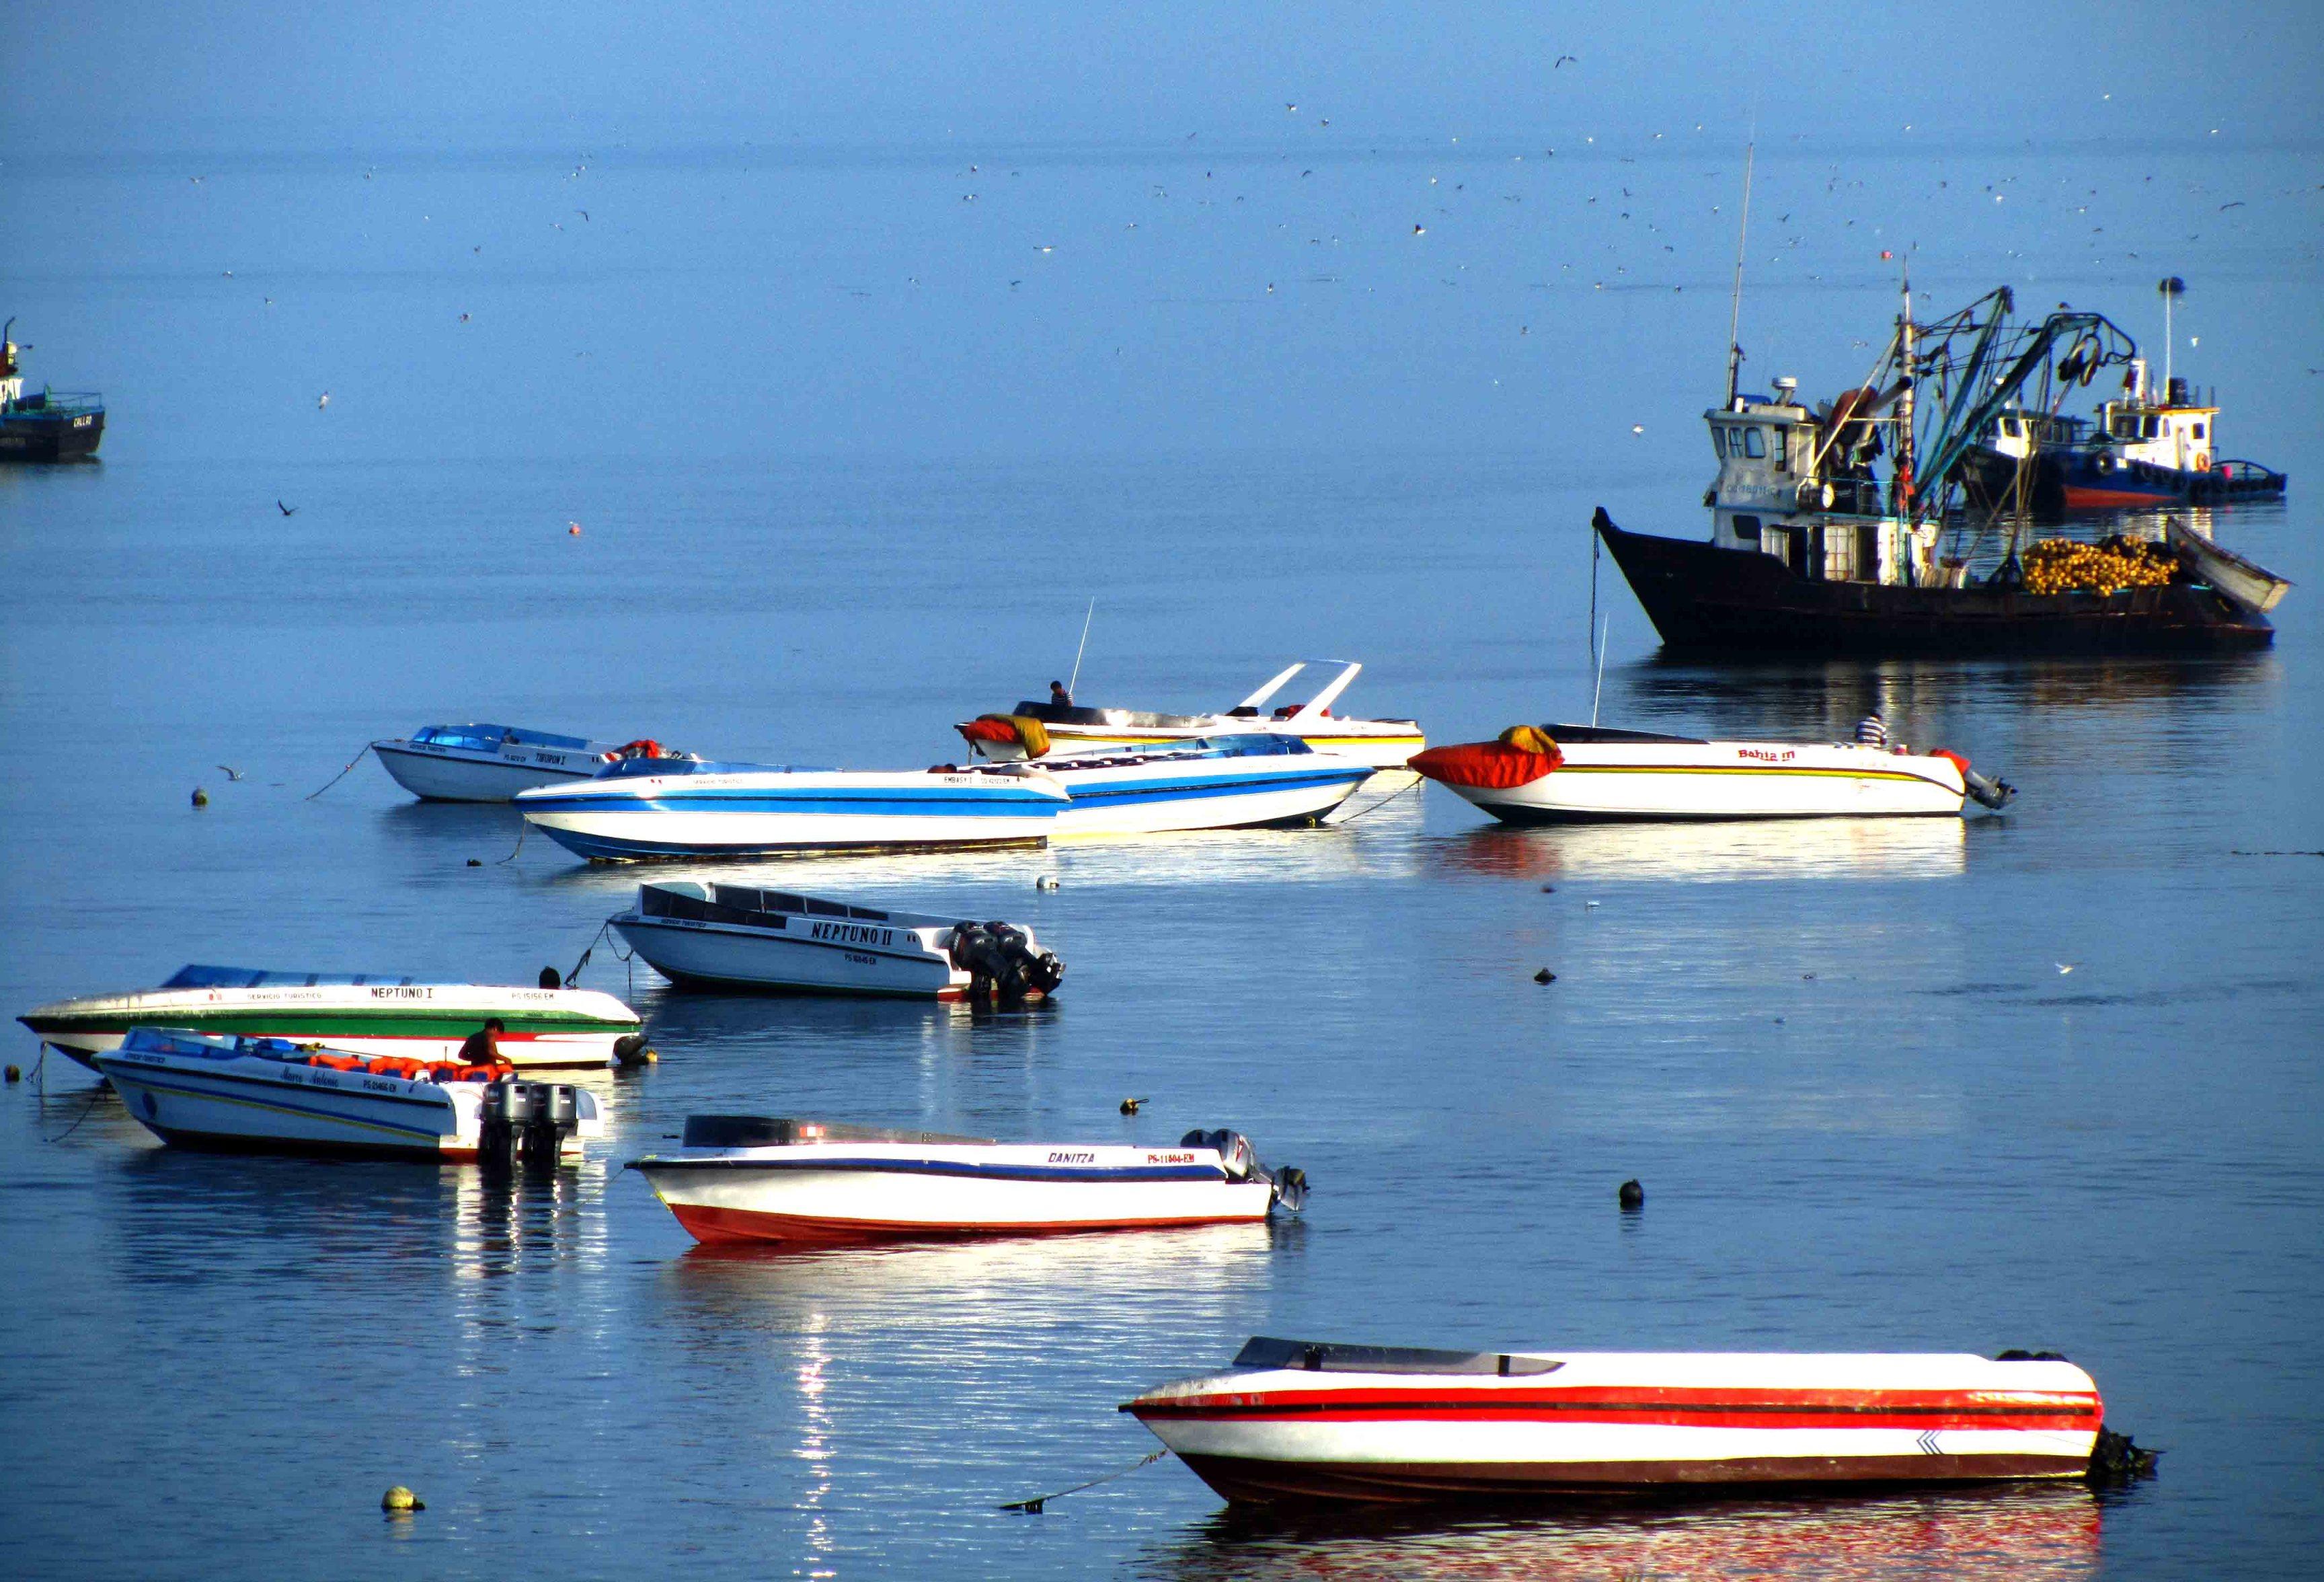 Bungavilla Tours nos preparó el viaje a Islas Ballestas. Buganvilla Tours prepared our trip to Ballestas Islands. Paracas, Peru Photo credit, placeOK